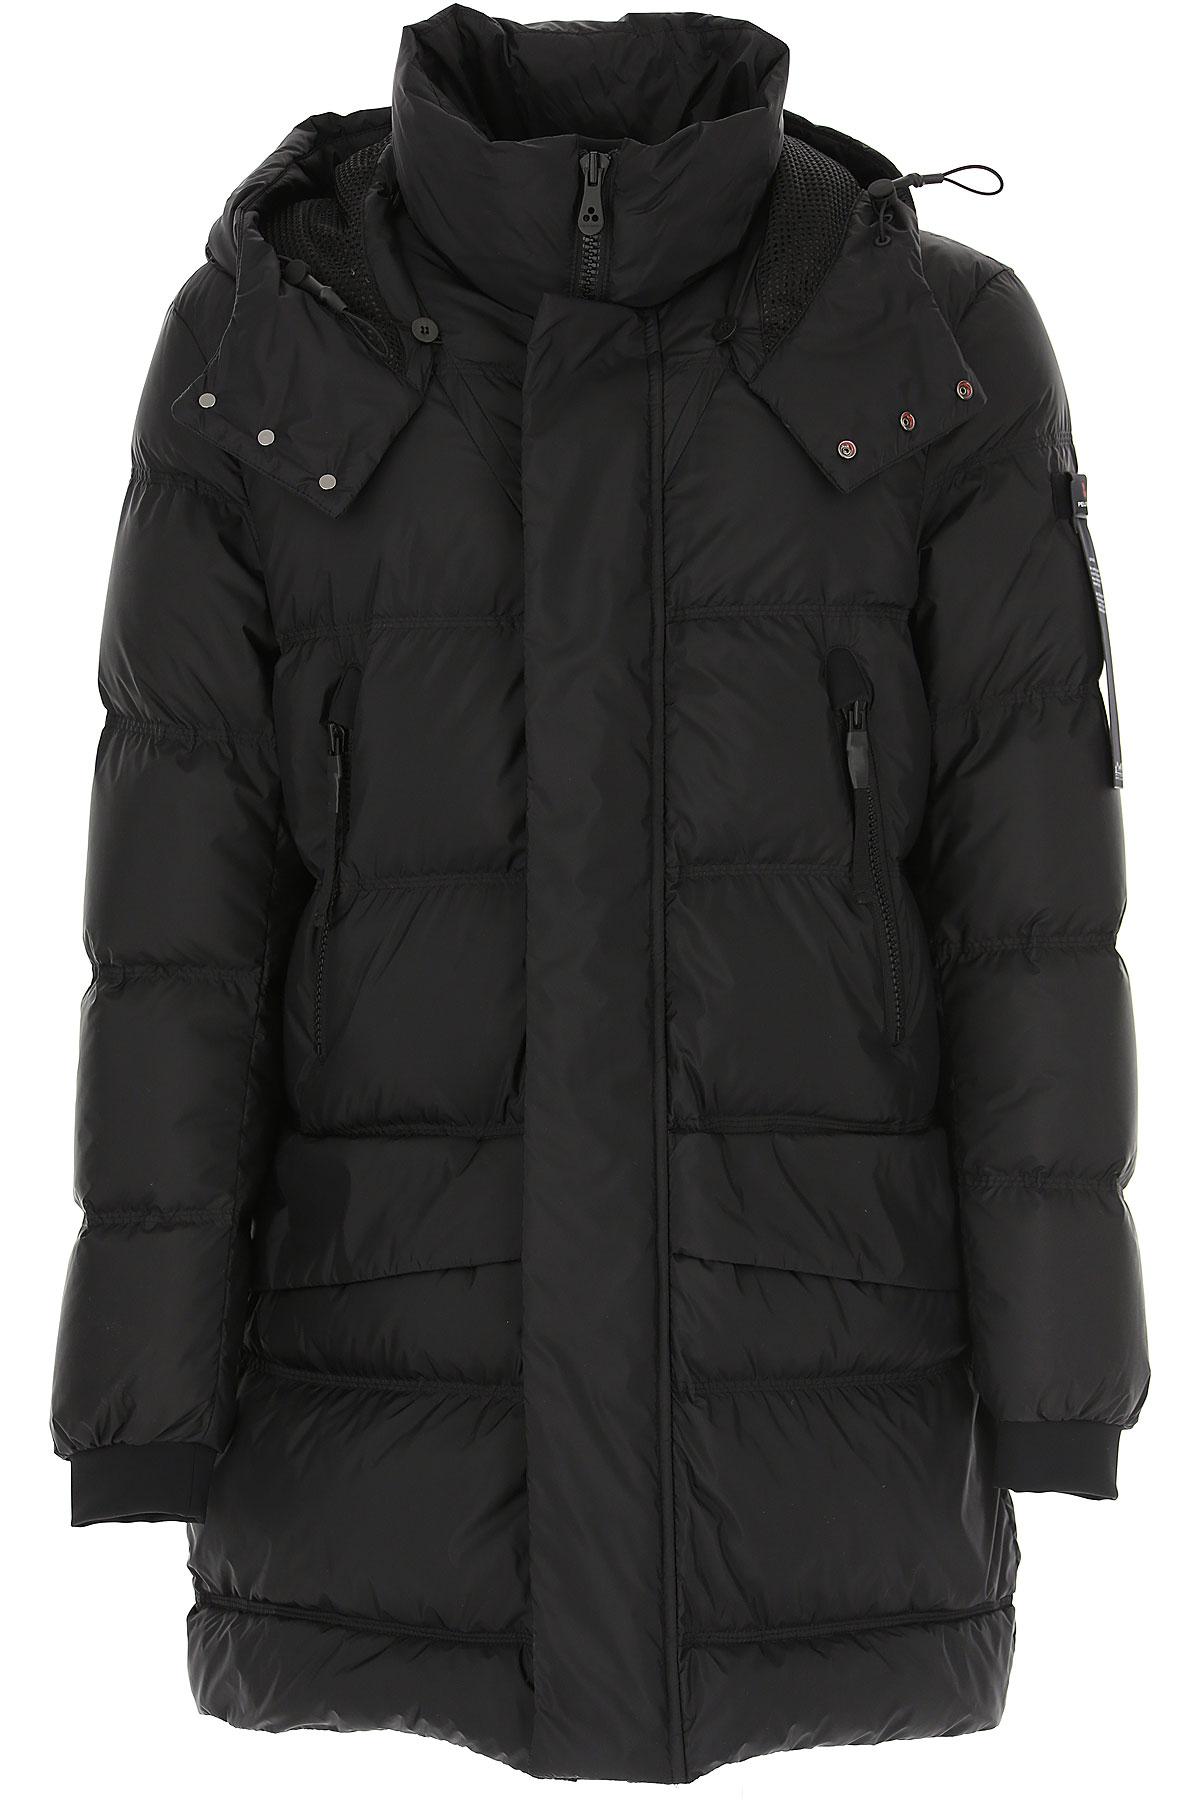 Peuterey Down Jacket for Men, Puffer Ski Jacket On Sale, Black, Down, 2019, L S